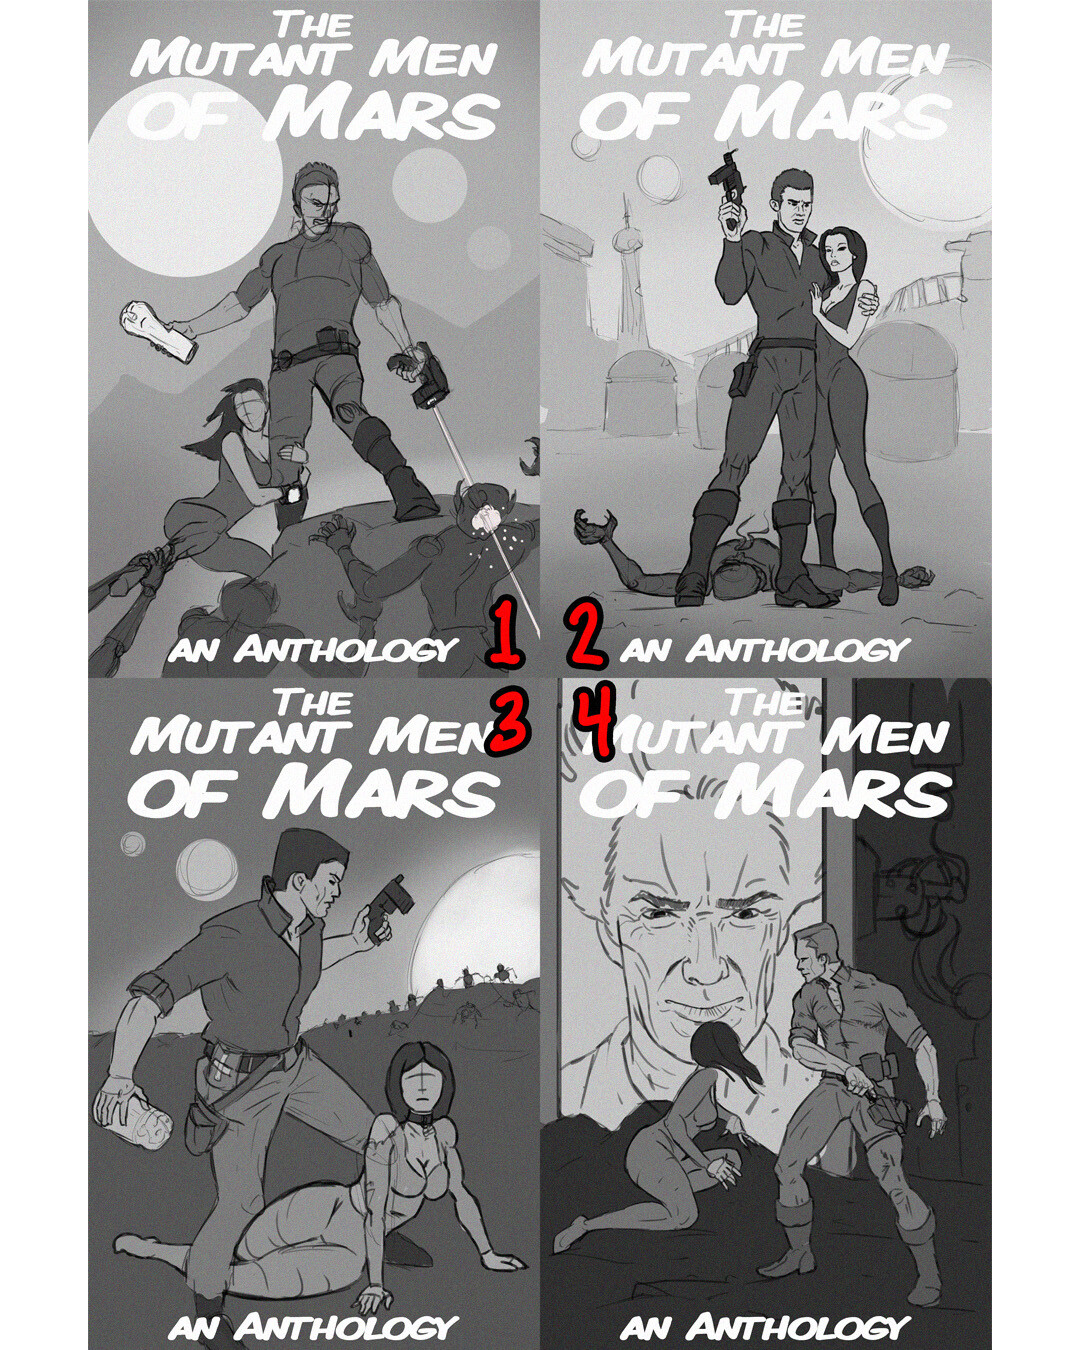 Mutant Men Thumbnails